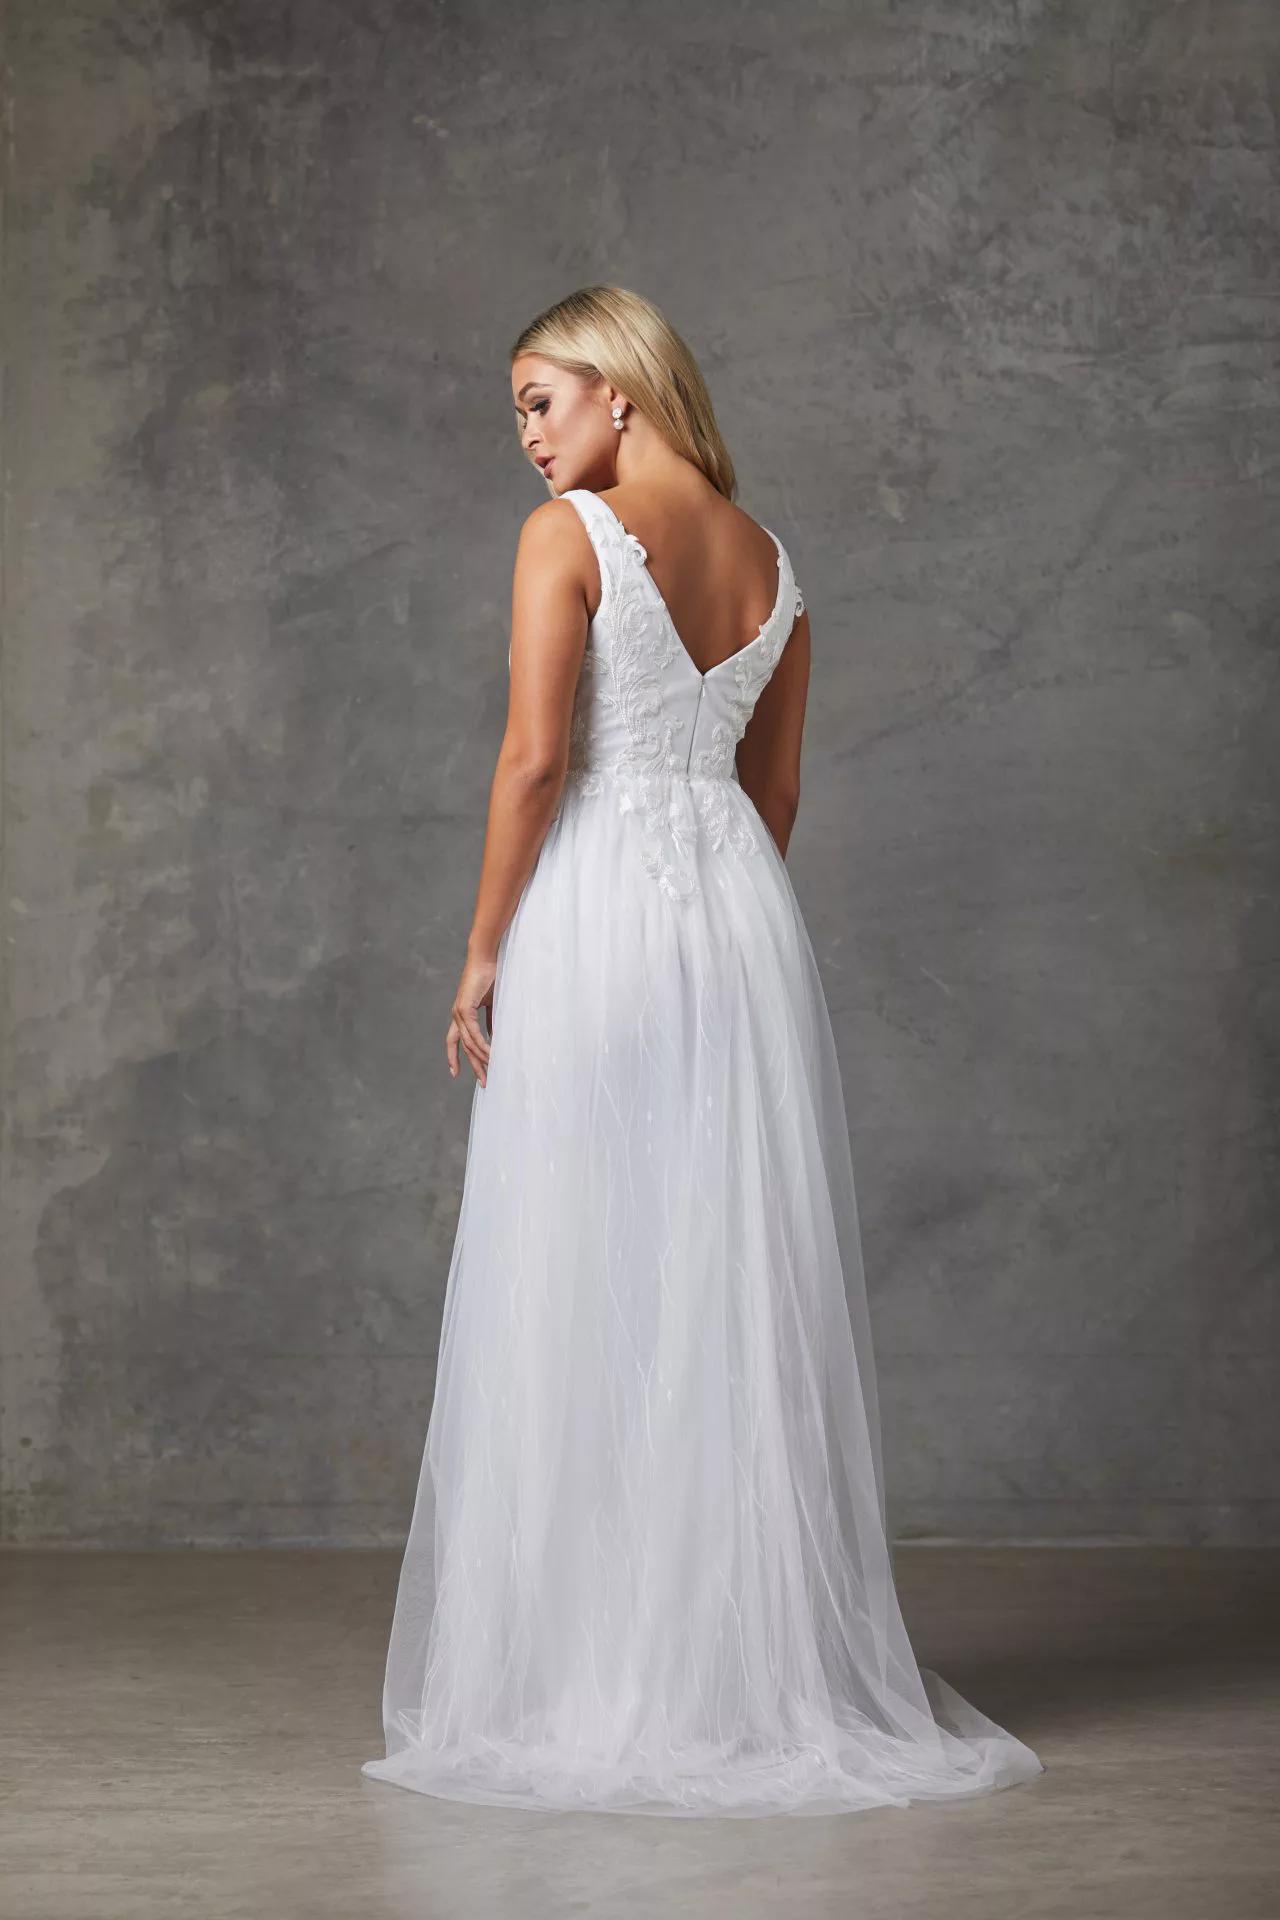 Liv Wedding Dress by Tania Olsen - White